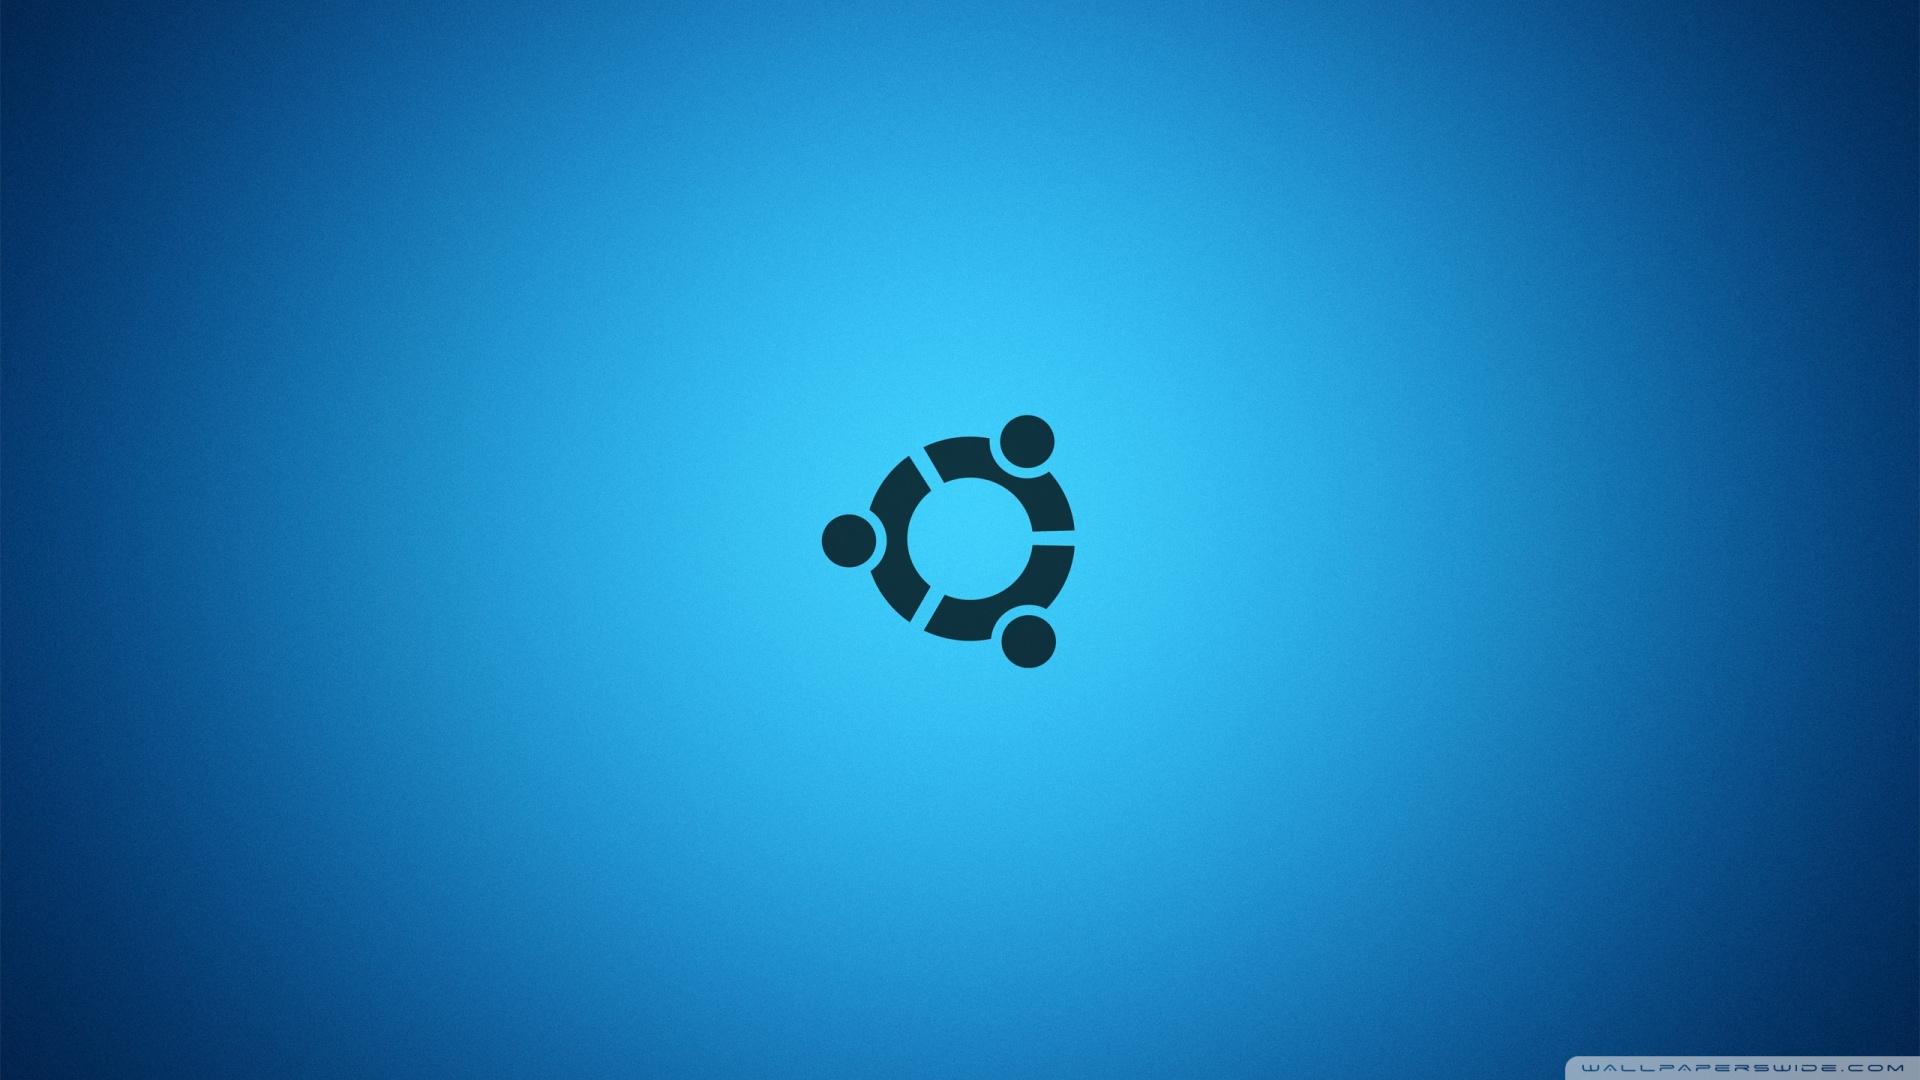 Download Ubuntu Desktop Blue Wallpaper 1920x1080 1920x1080